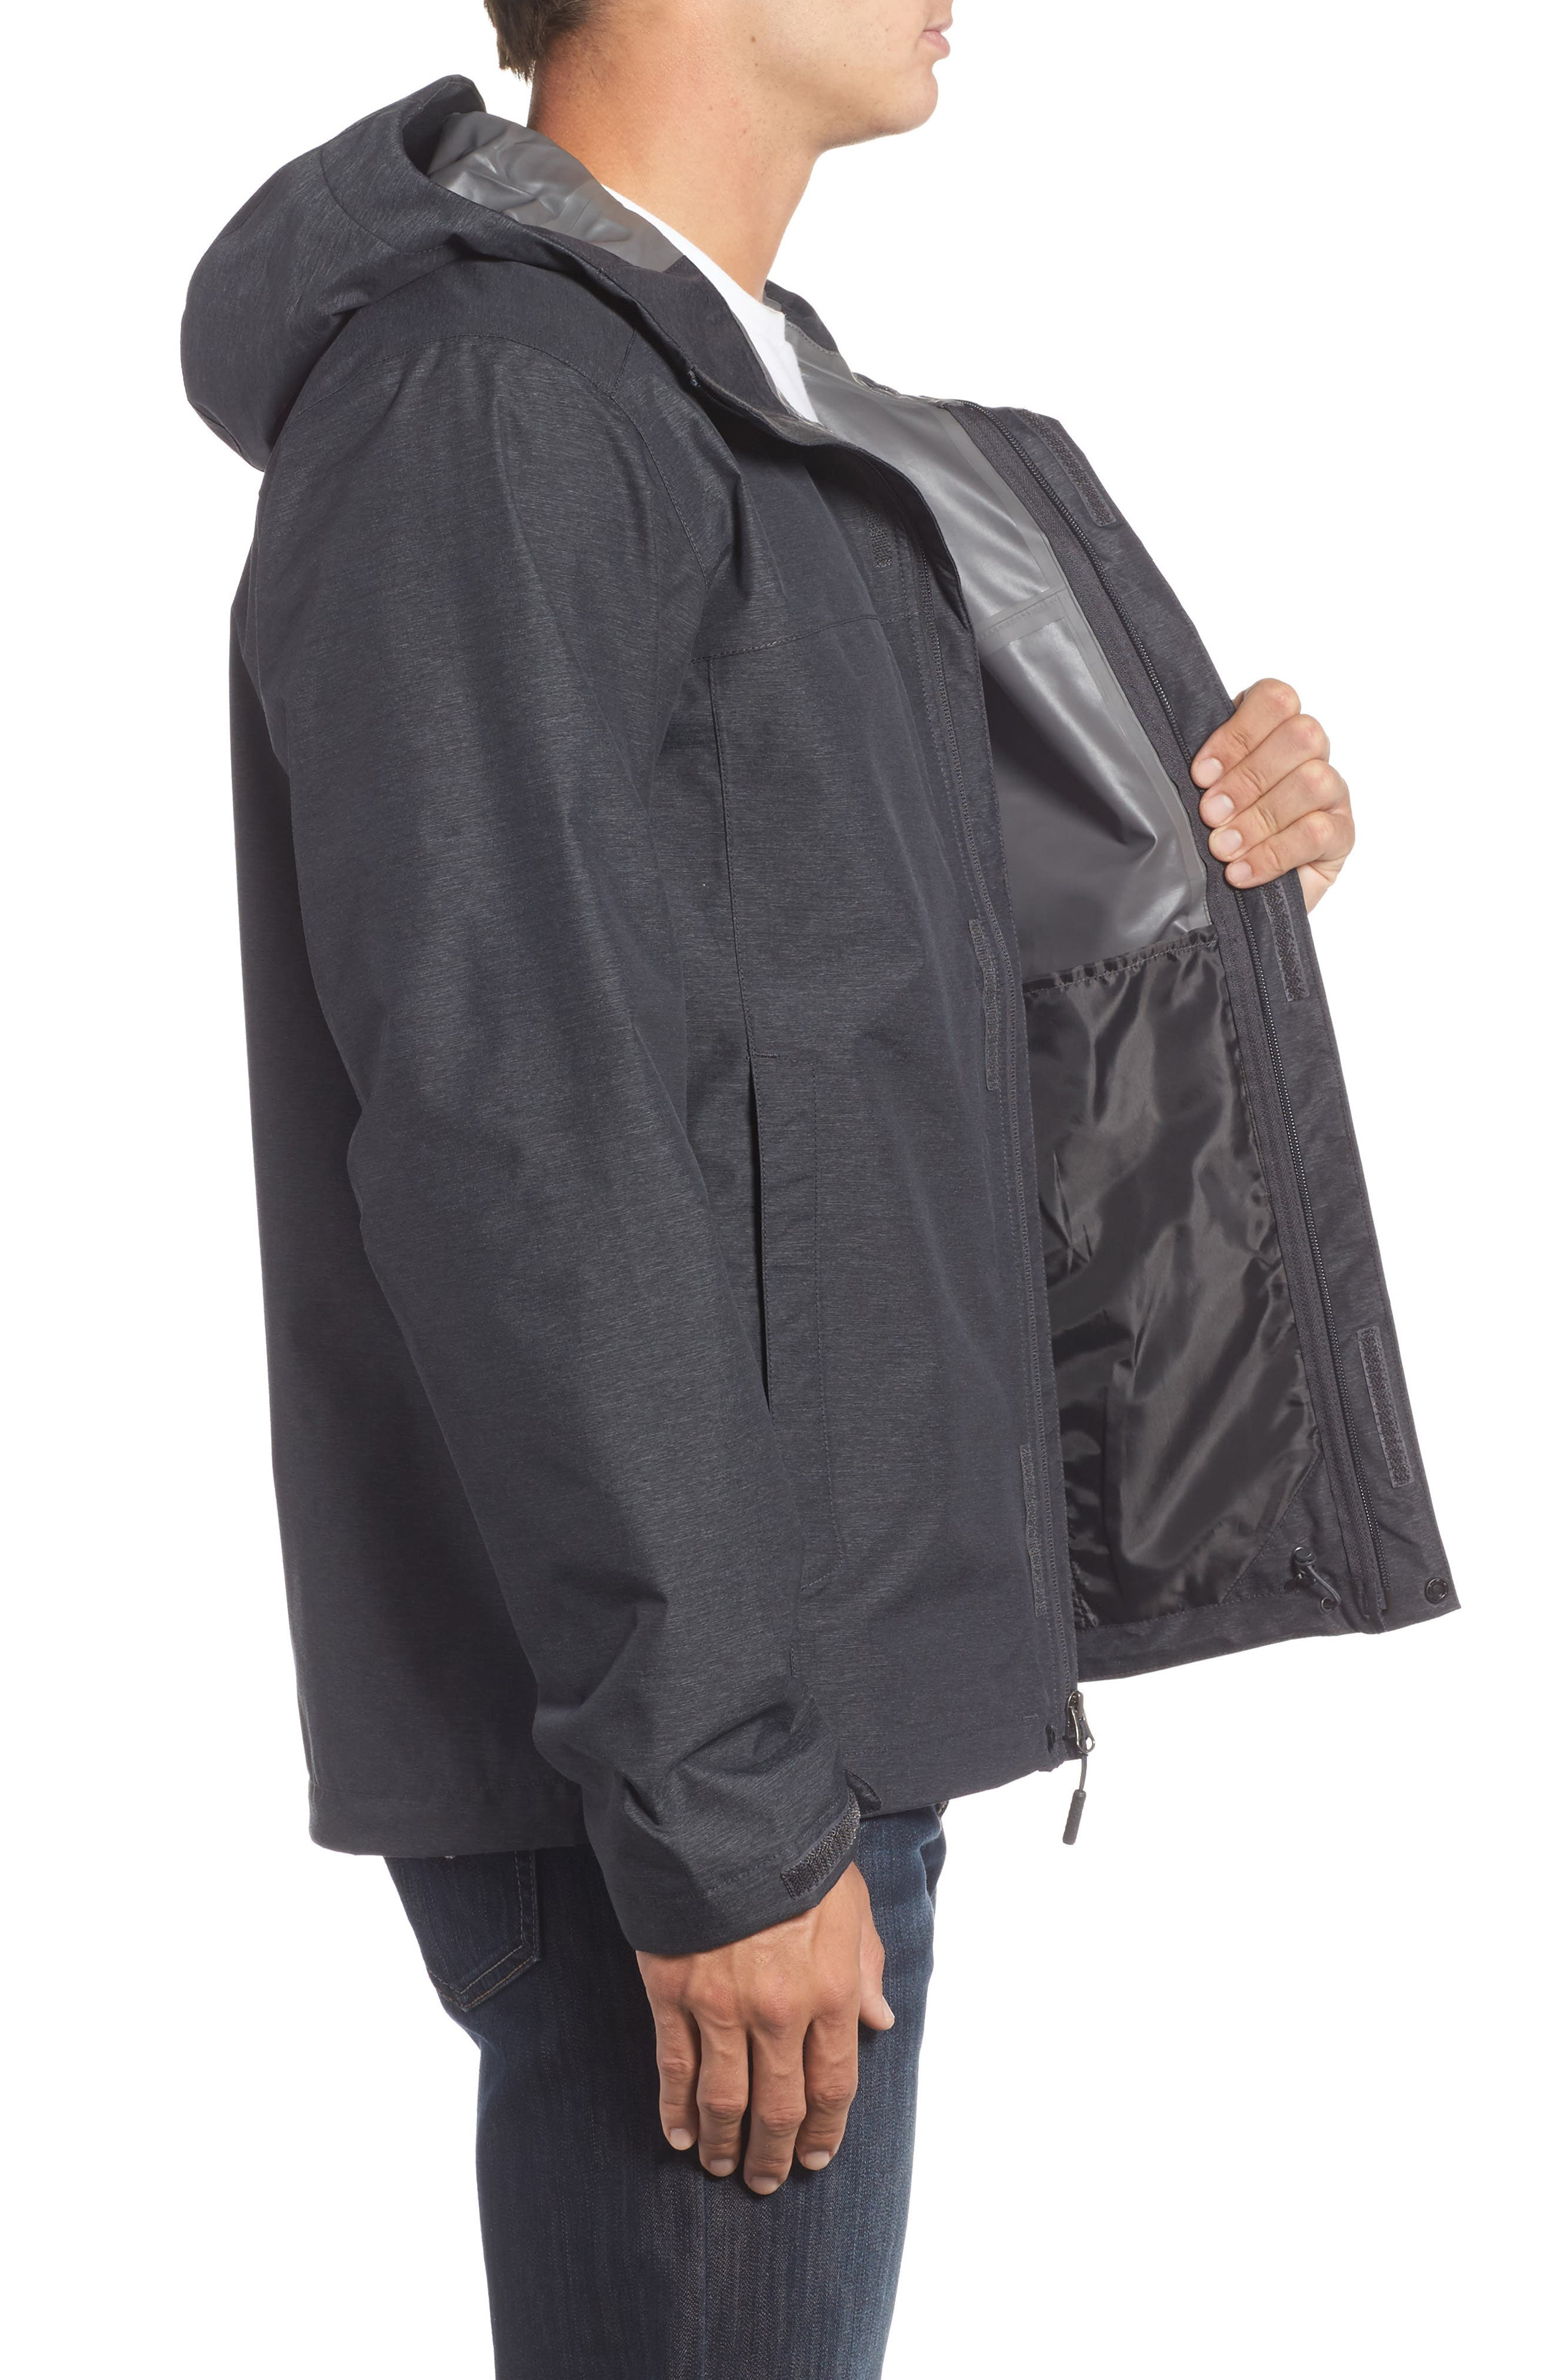 Alternate Image 3  - The North Face Venture 2 Waterproof Jacket